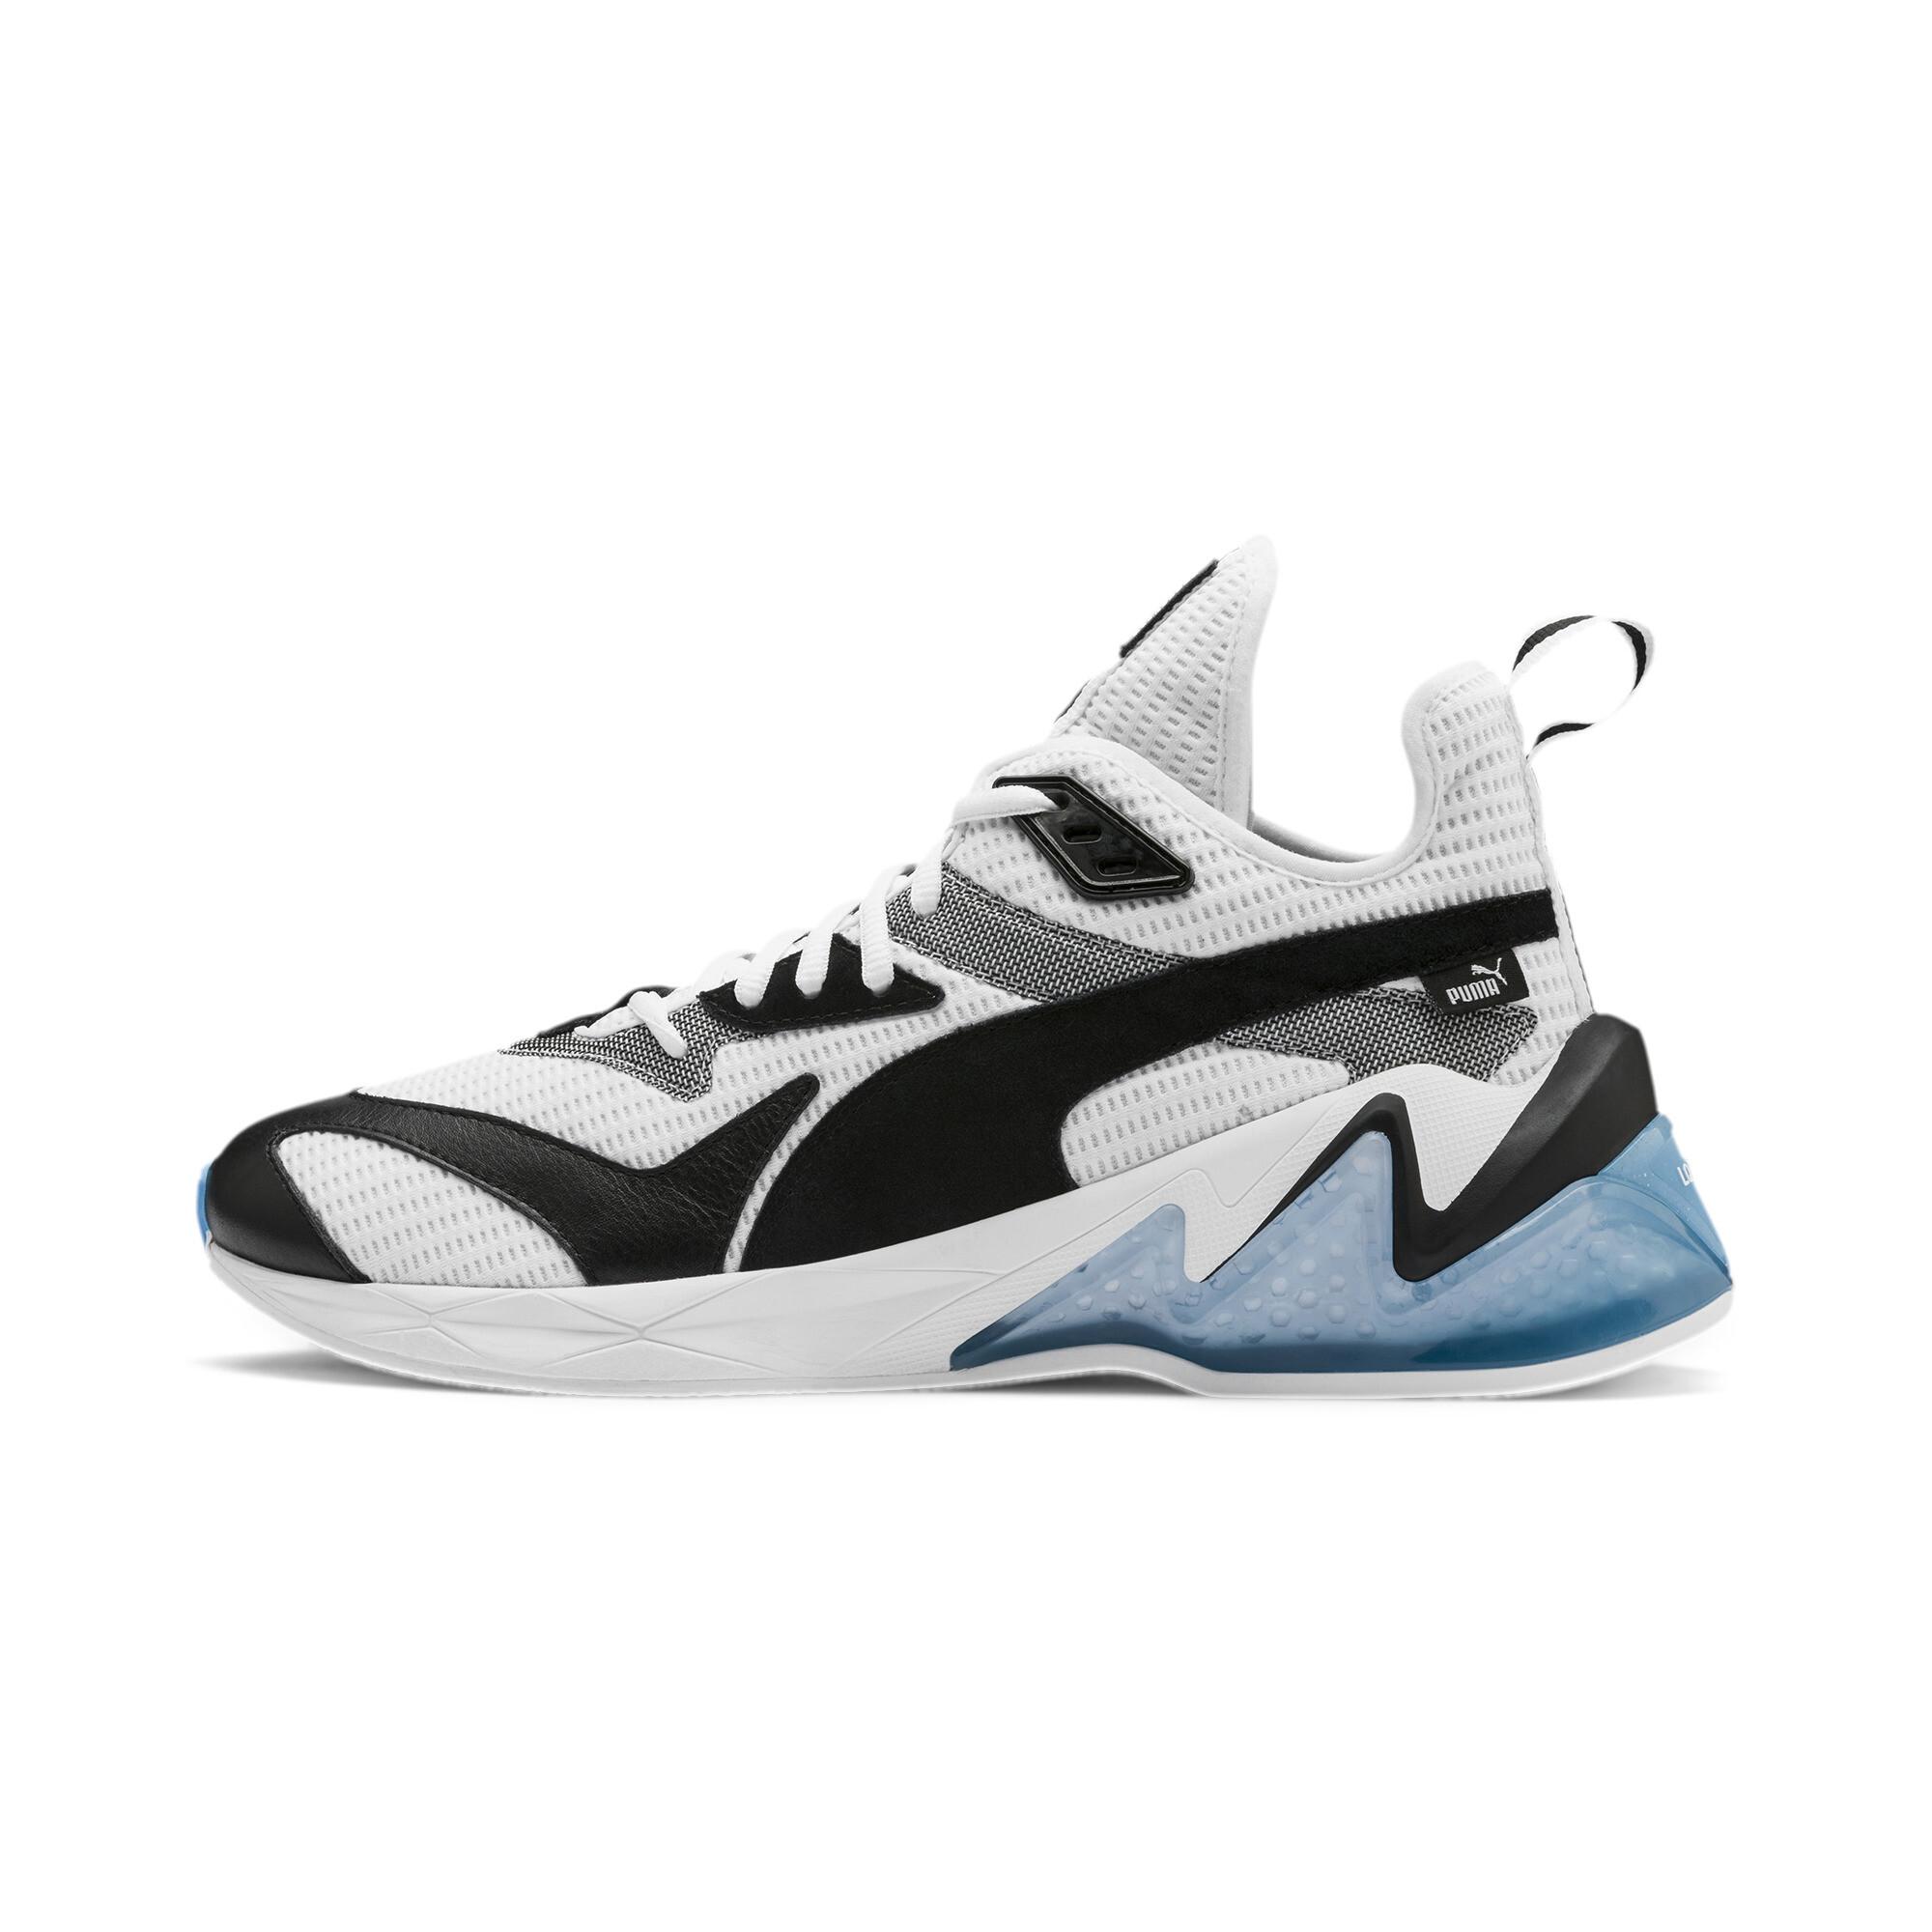 PUMA-Men-039-s-LQDCELL-Origin-Training-Shoes thumbnail 12